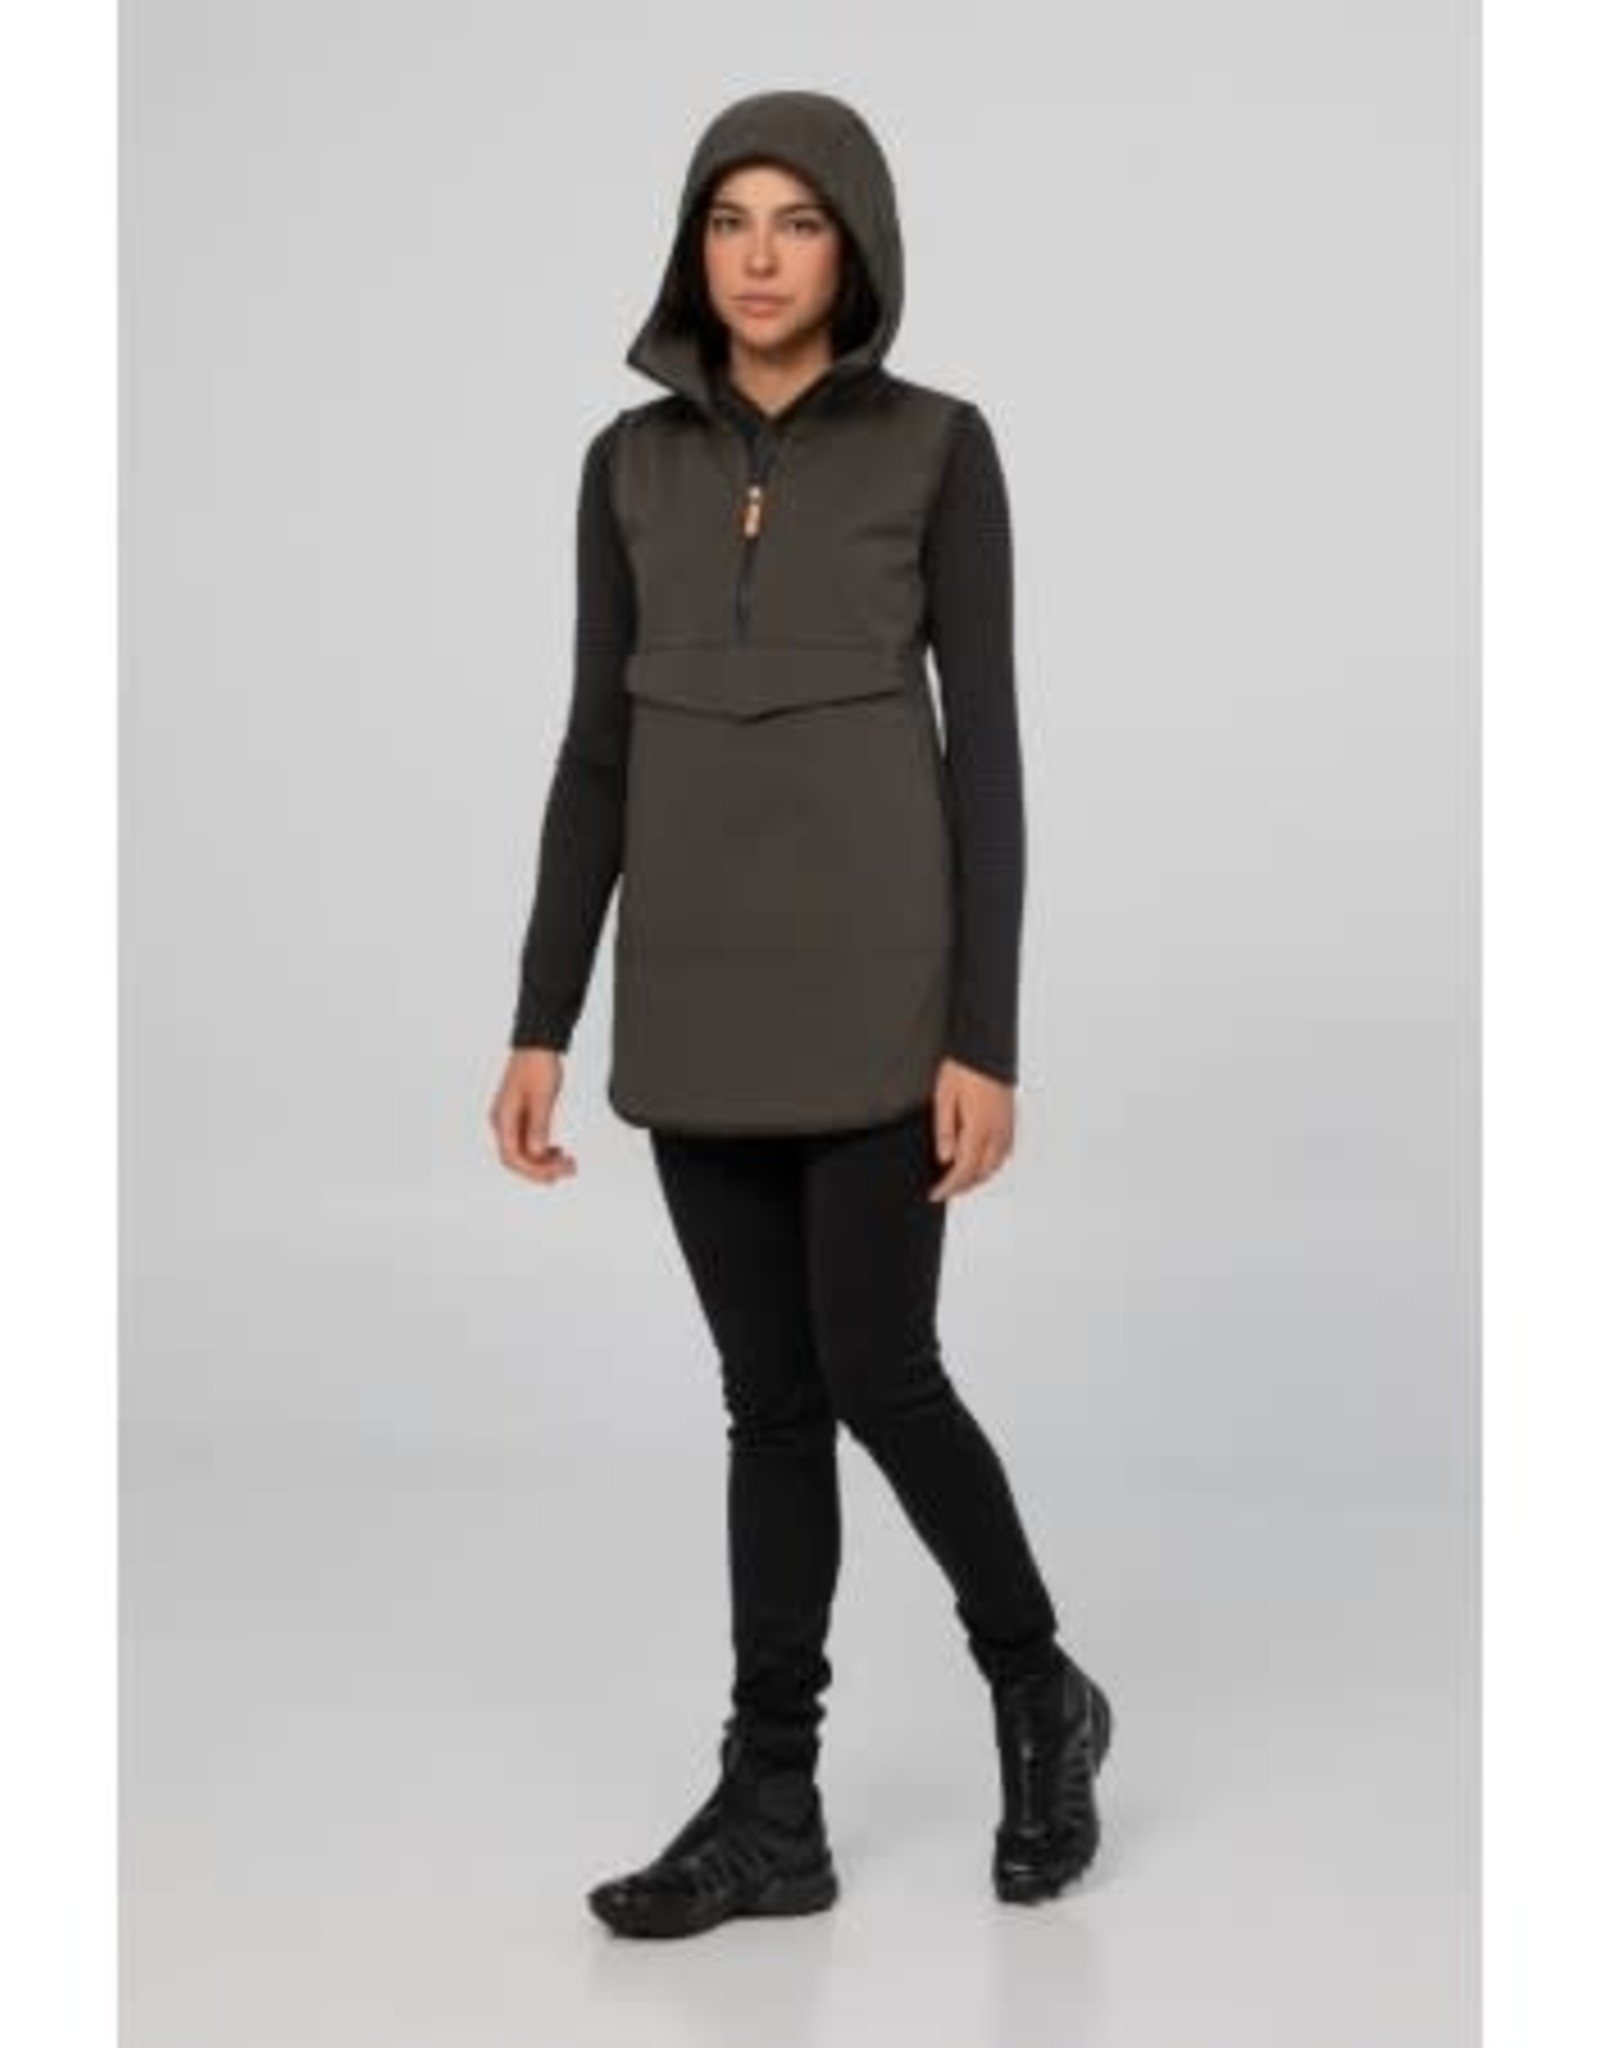 Indygena Cangur pullover vest